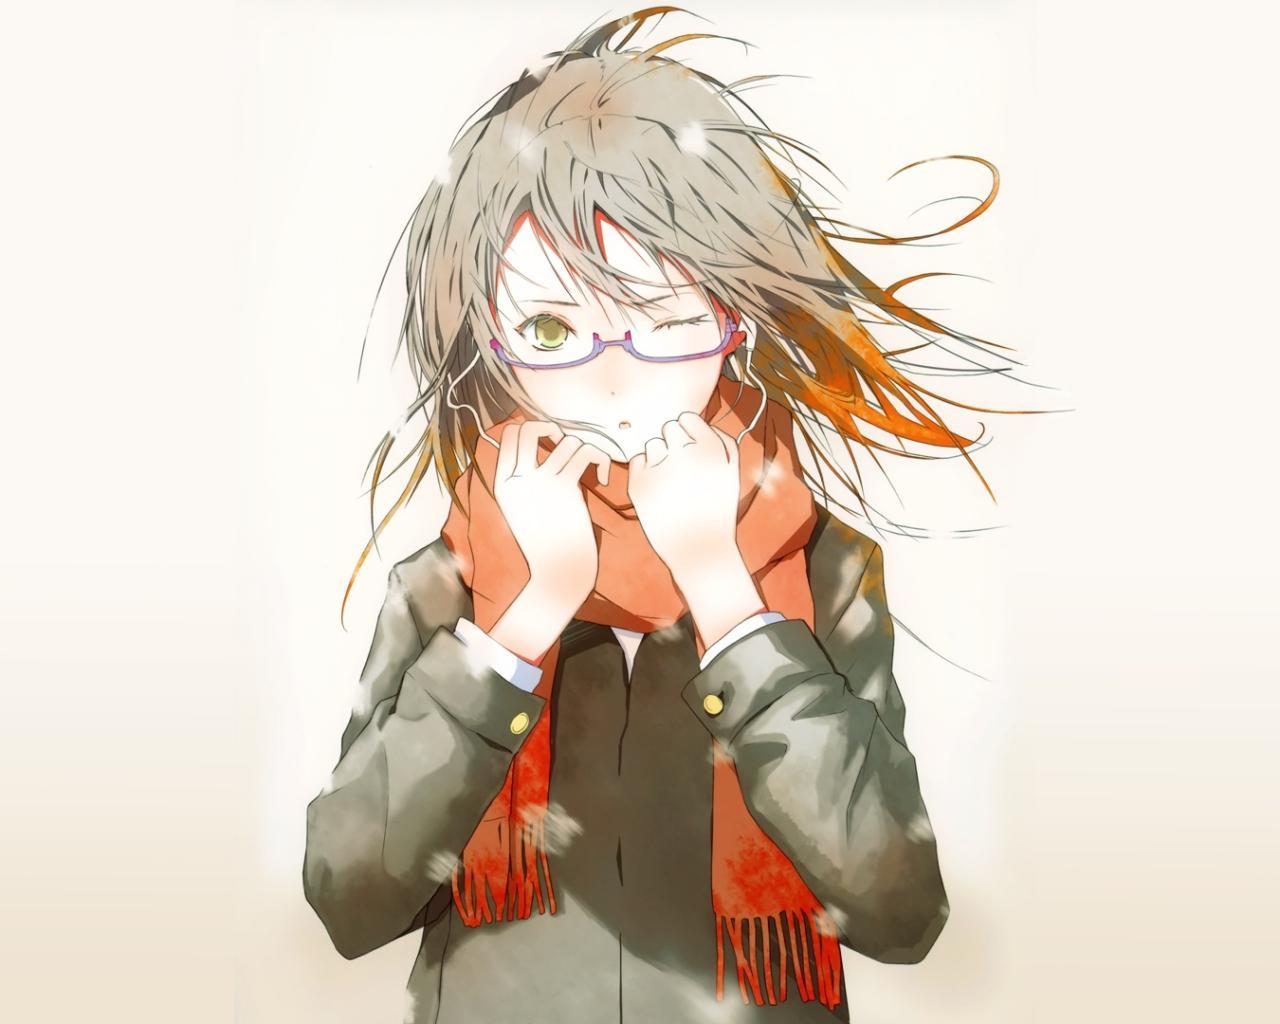 [Missão] A Diversão dos Ayakashis Tumblr_static_anime-girl-headphones-fuyuno-haruaki-green-eyes-headphone-98283